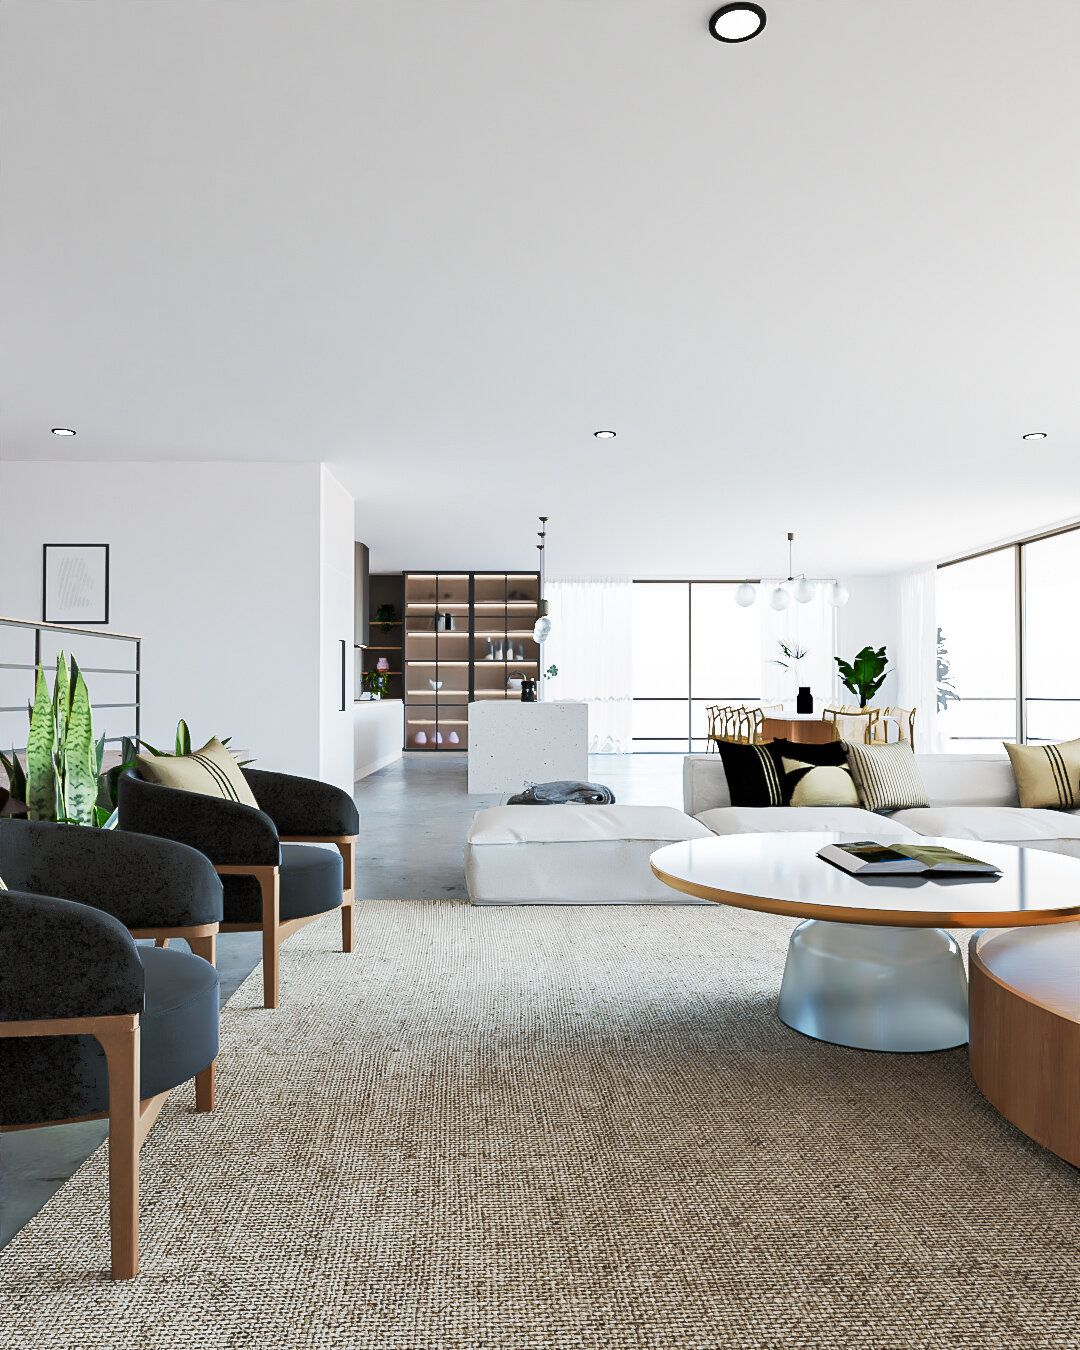 Andrea Upegui Design | Architecture & Interiors — JAZMIN LAKES APT